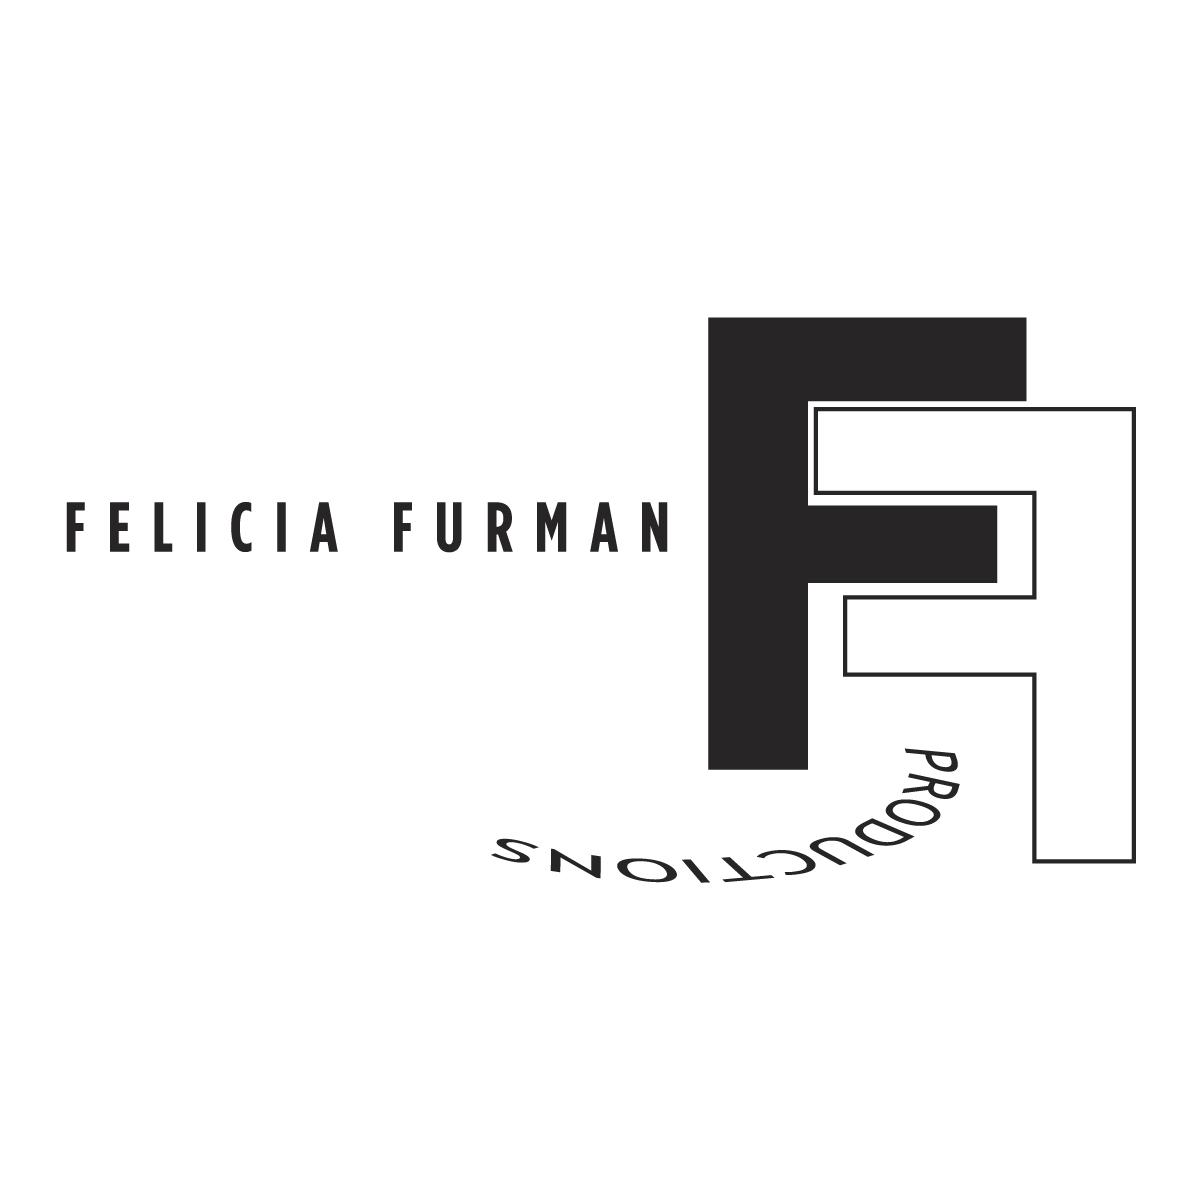 FF interlocking Fs.jpg